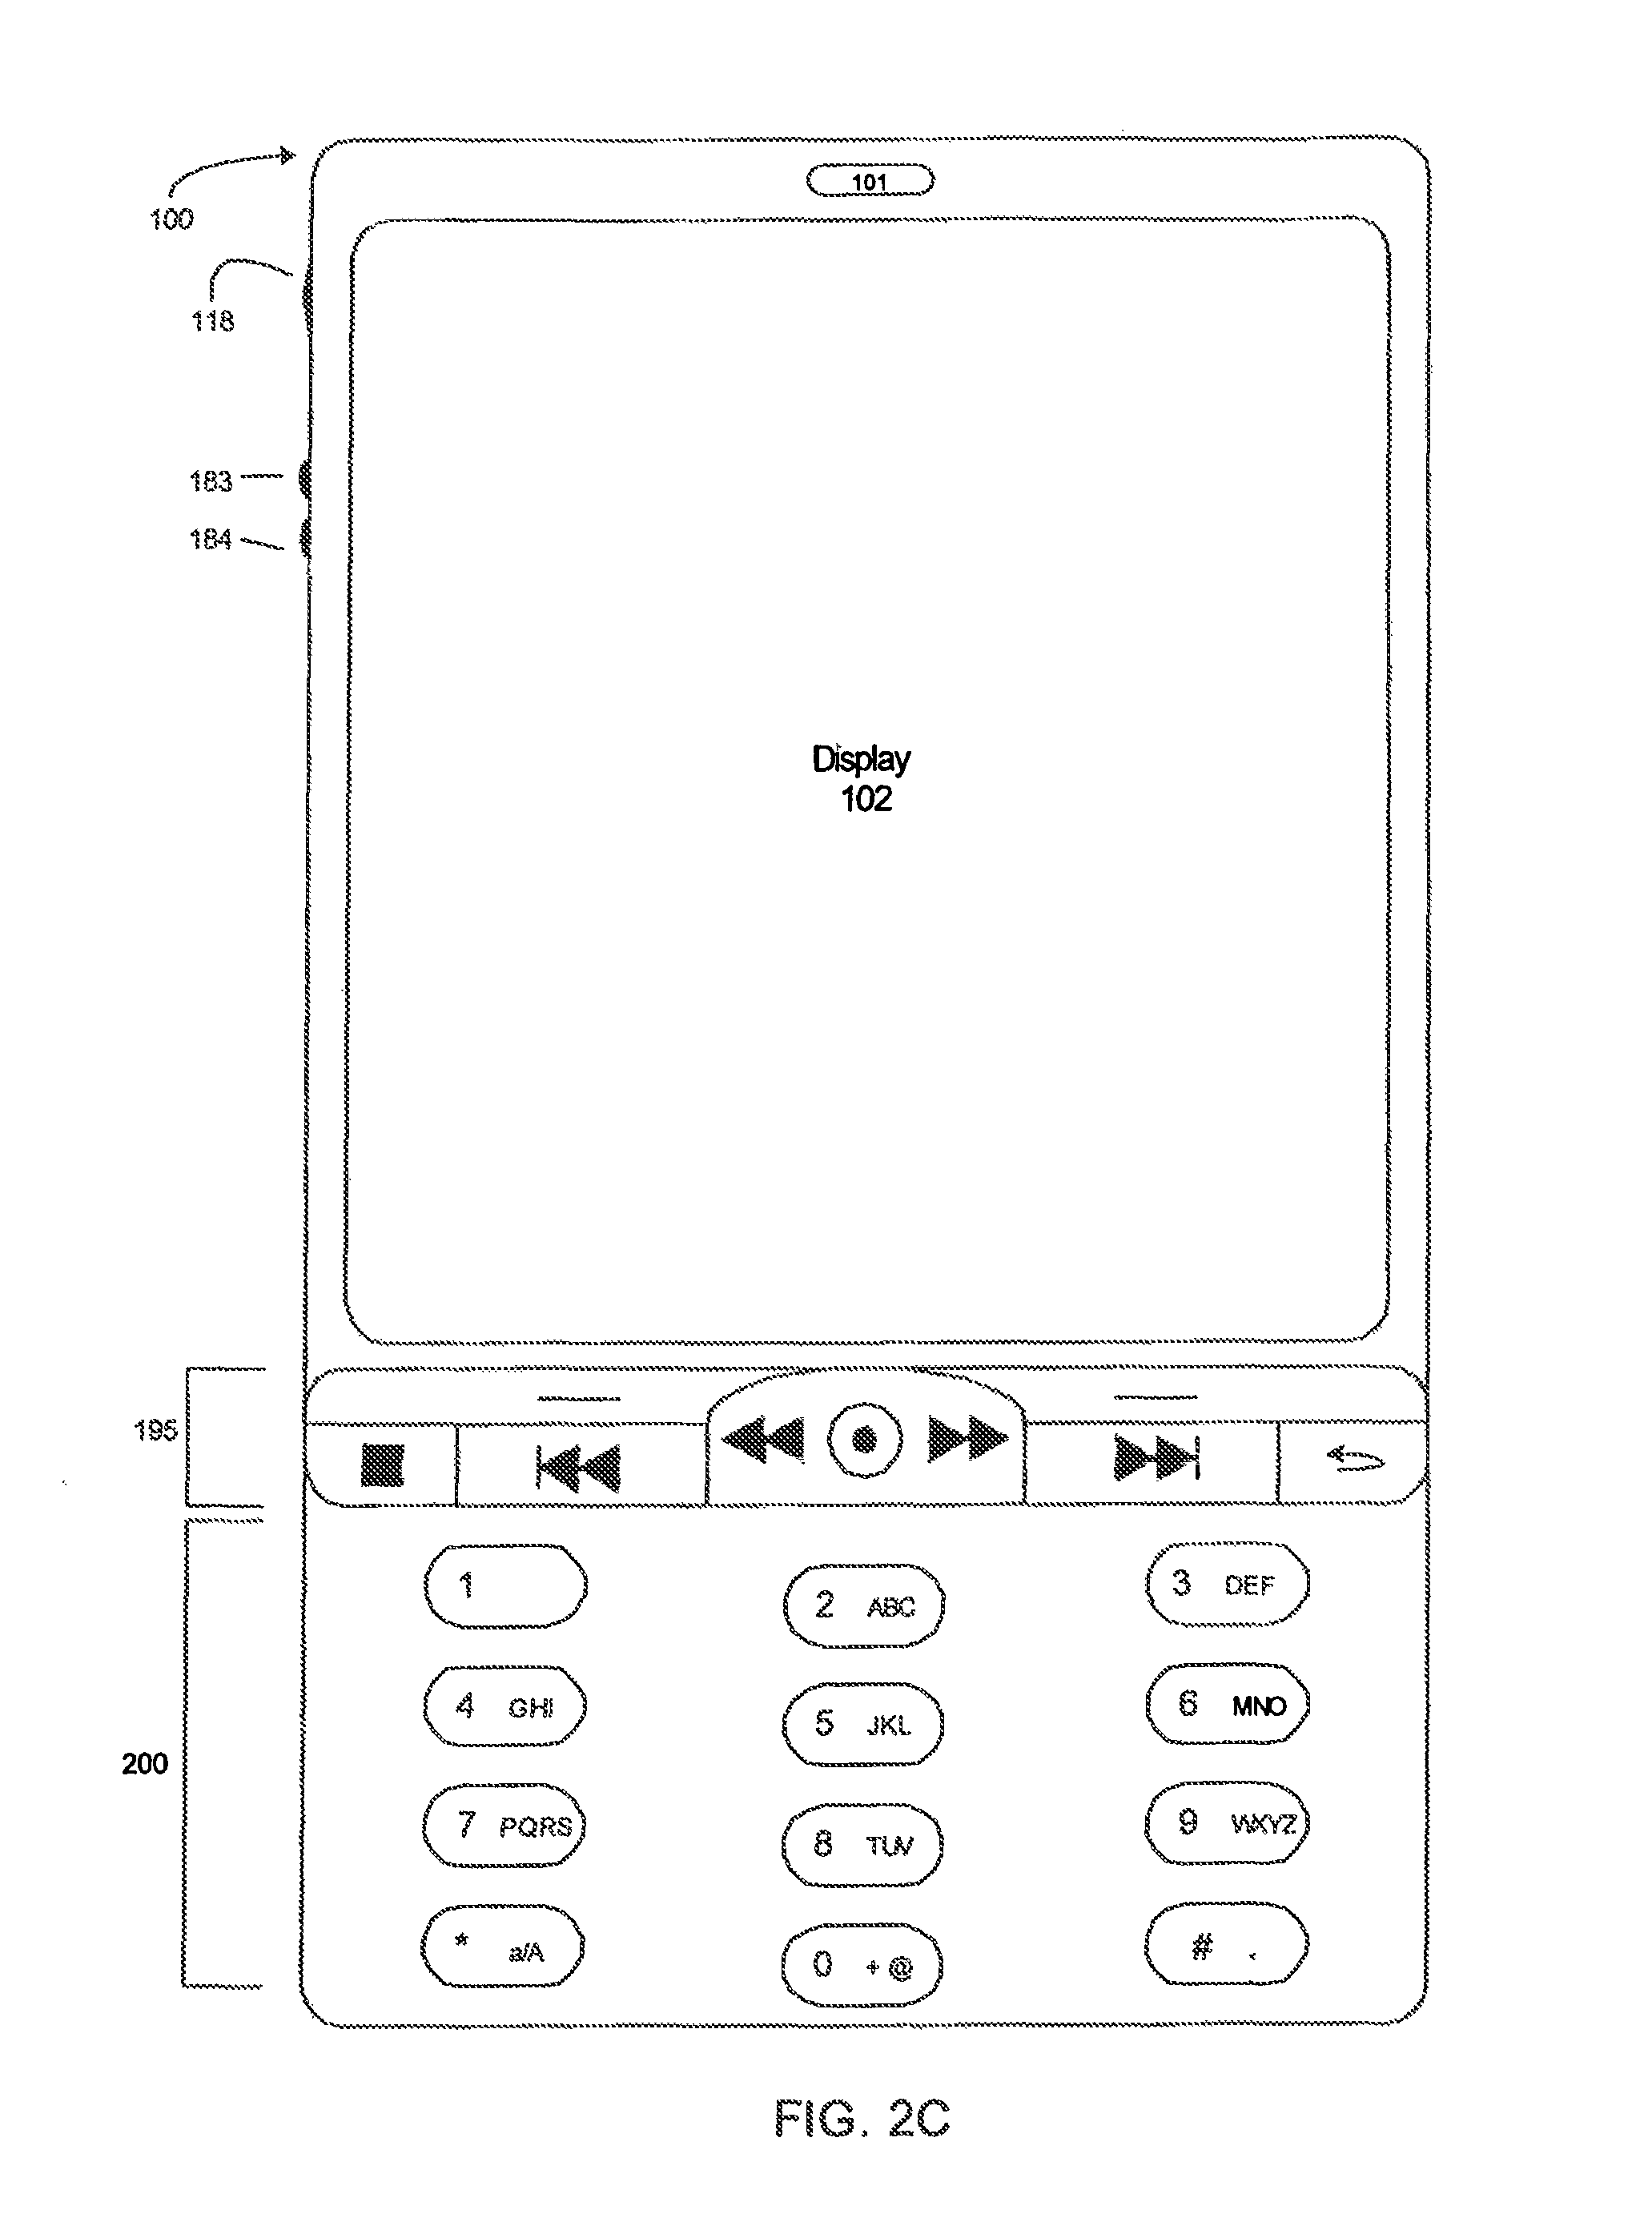 Patent US 8,583,044 B2